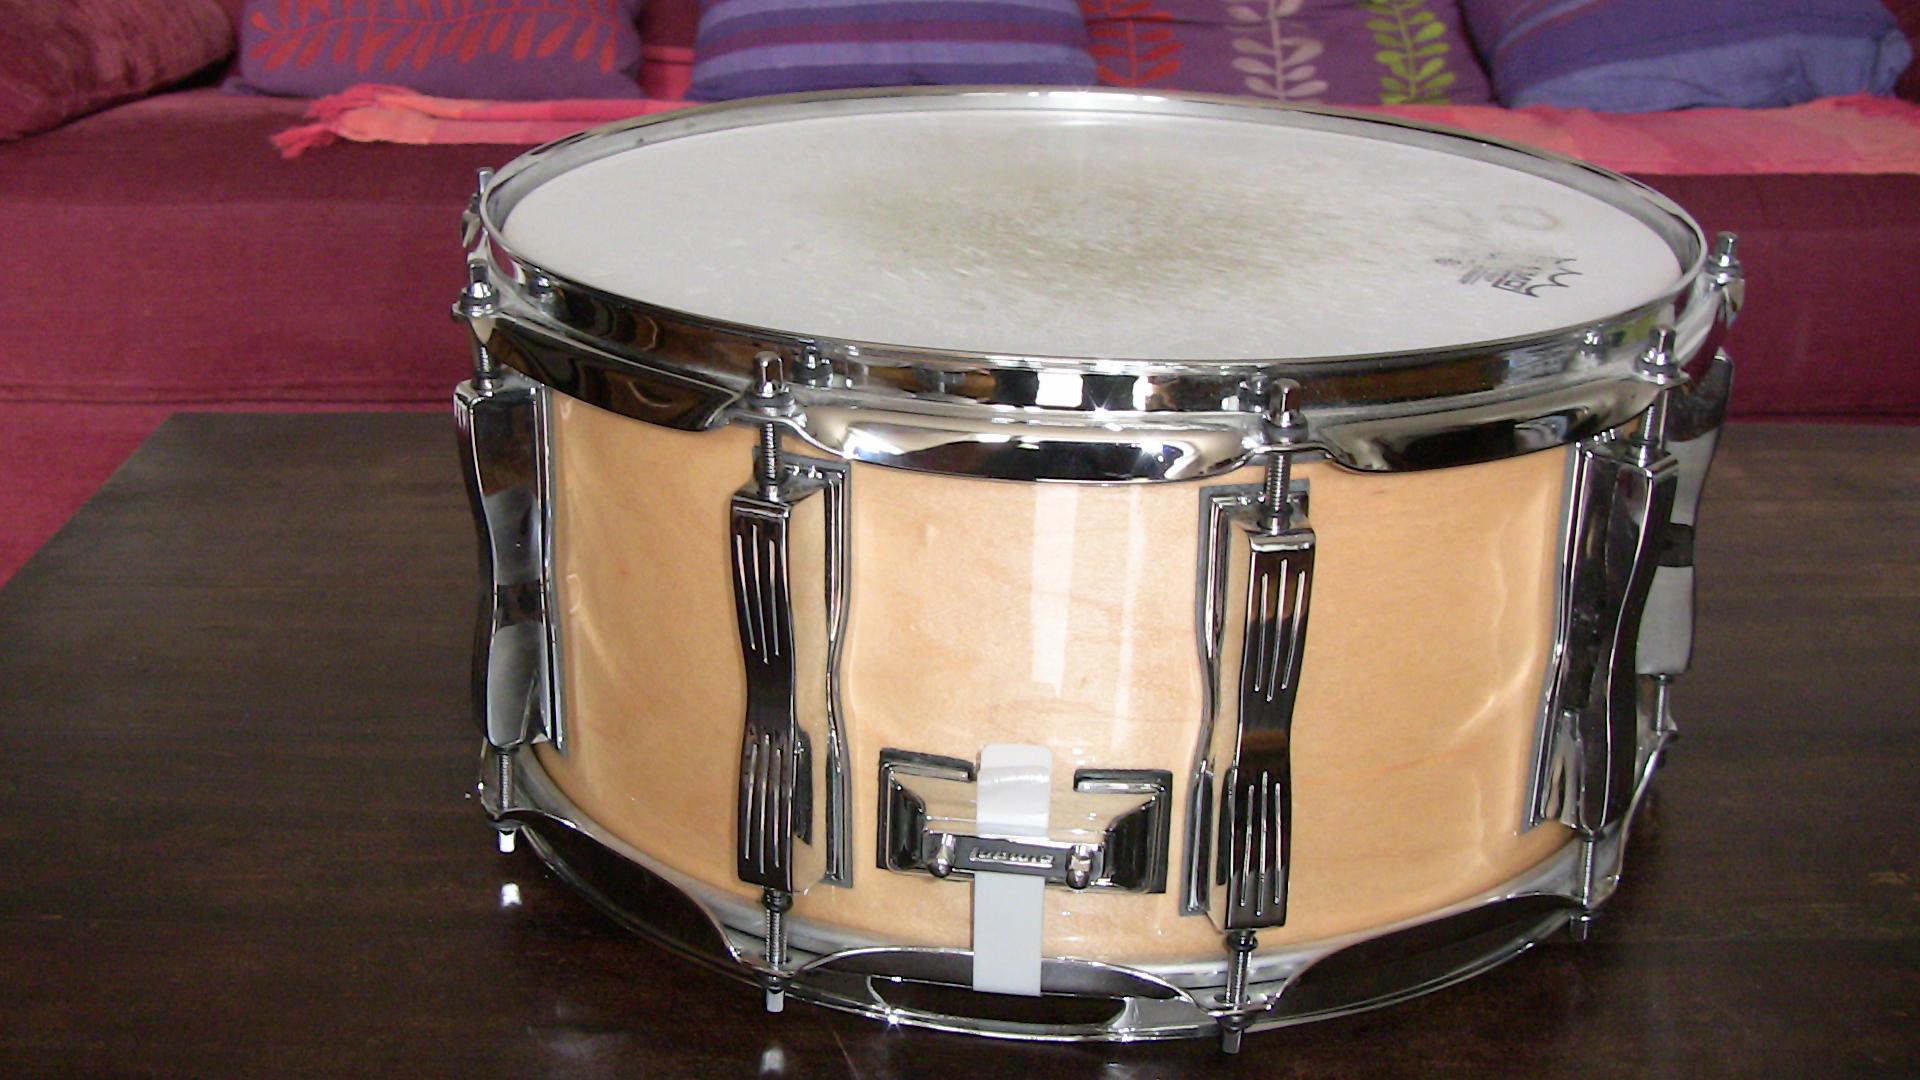 ludwig drums classic maple 14 x 6 5 snare image 679622 audiofanzine. Black Bedroom Furniture Sets. Home Design Ideas